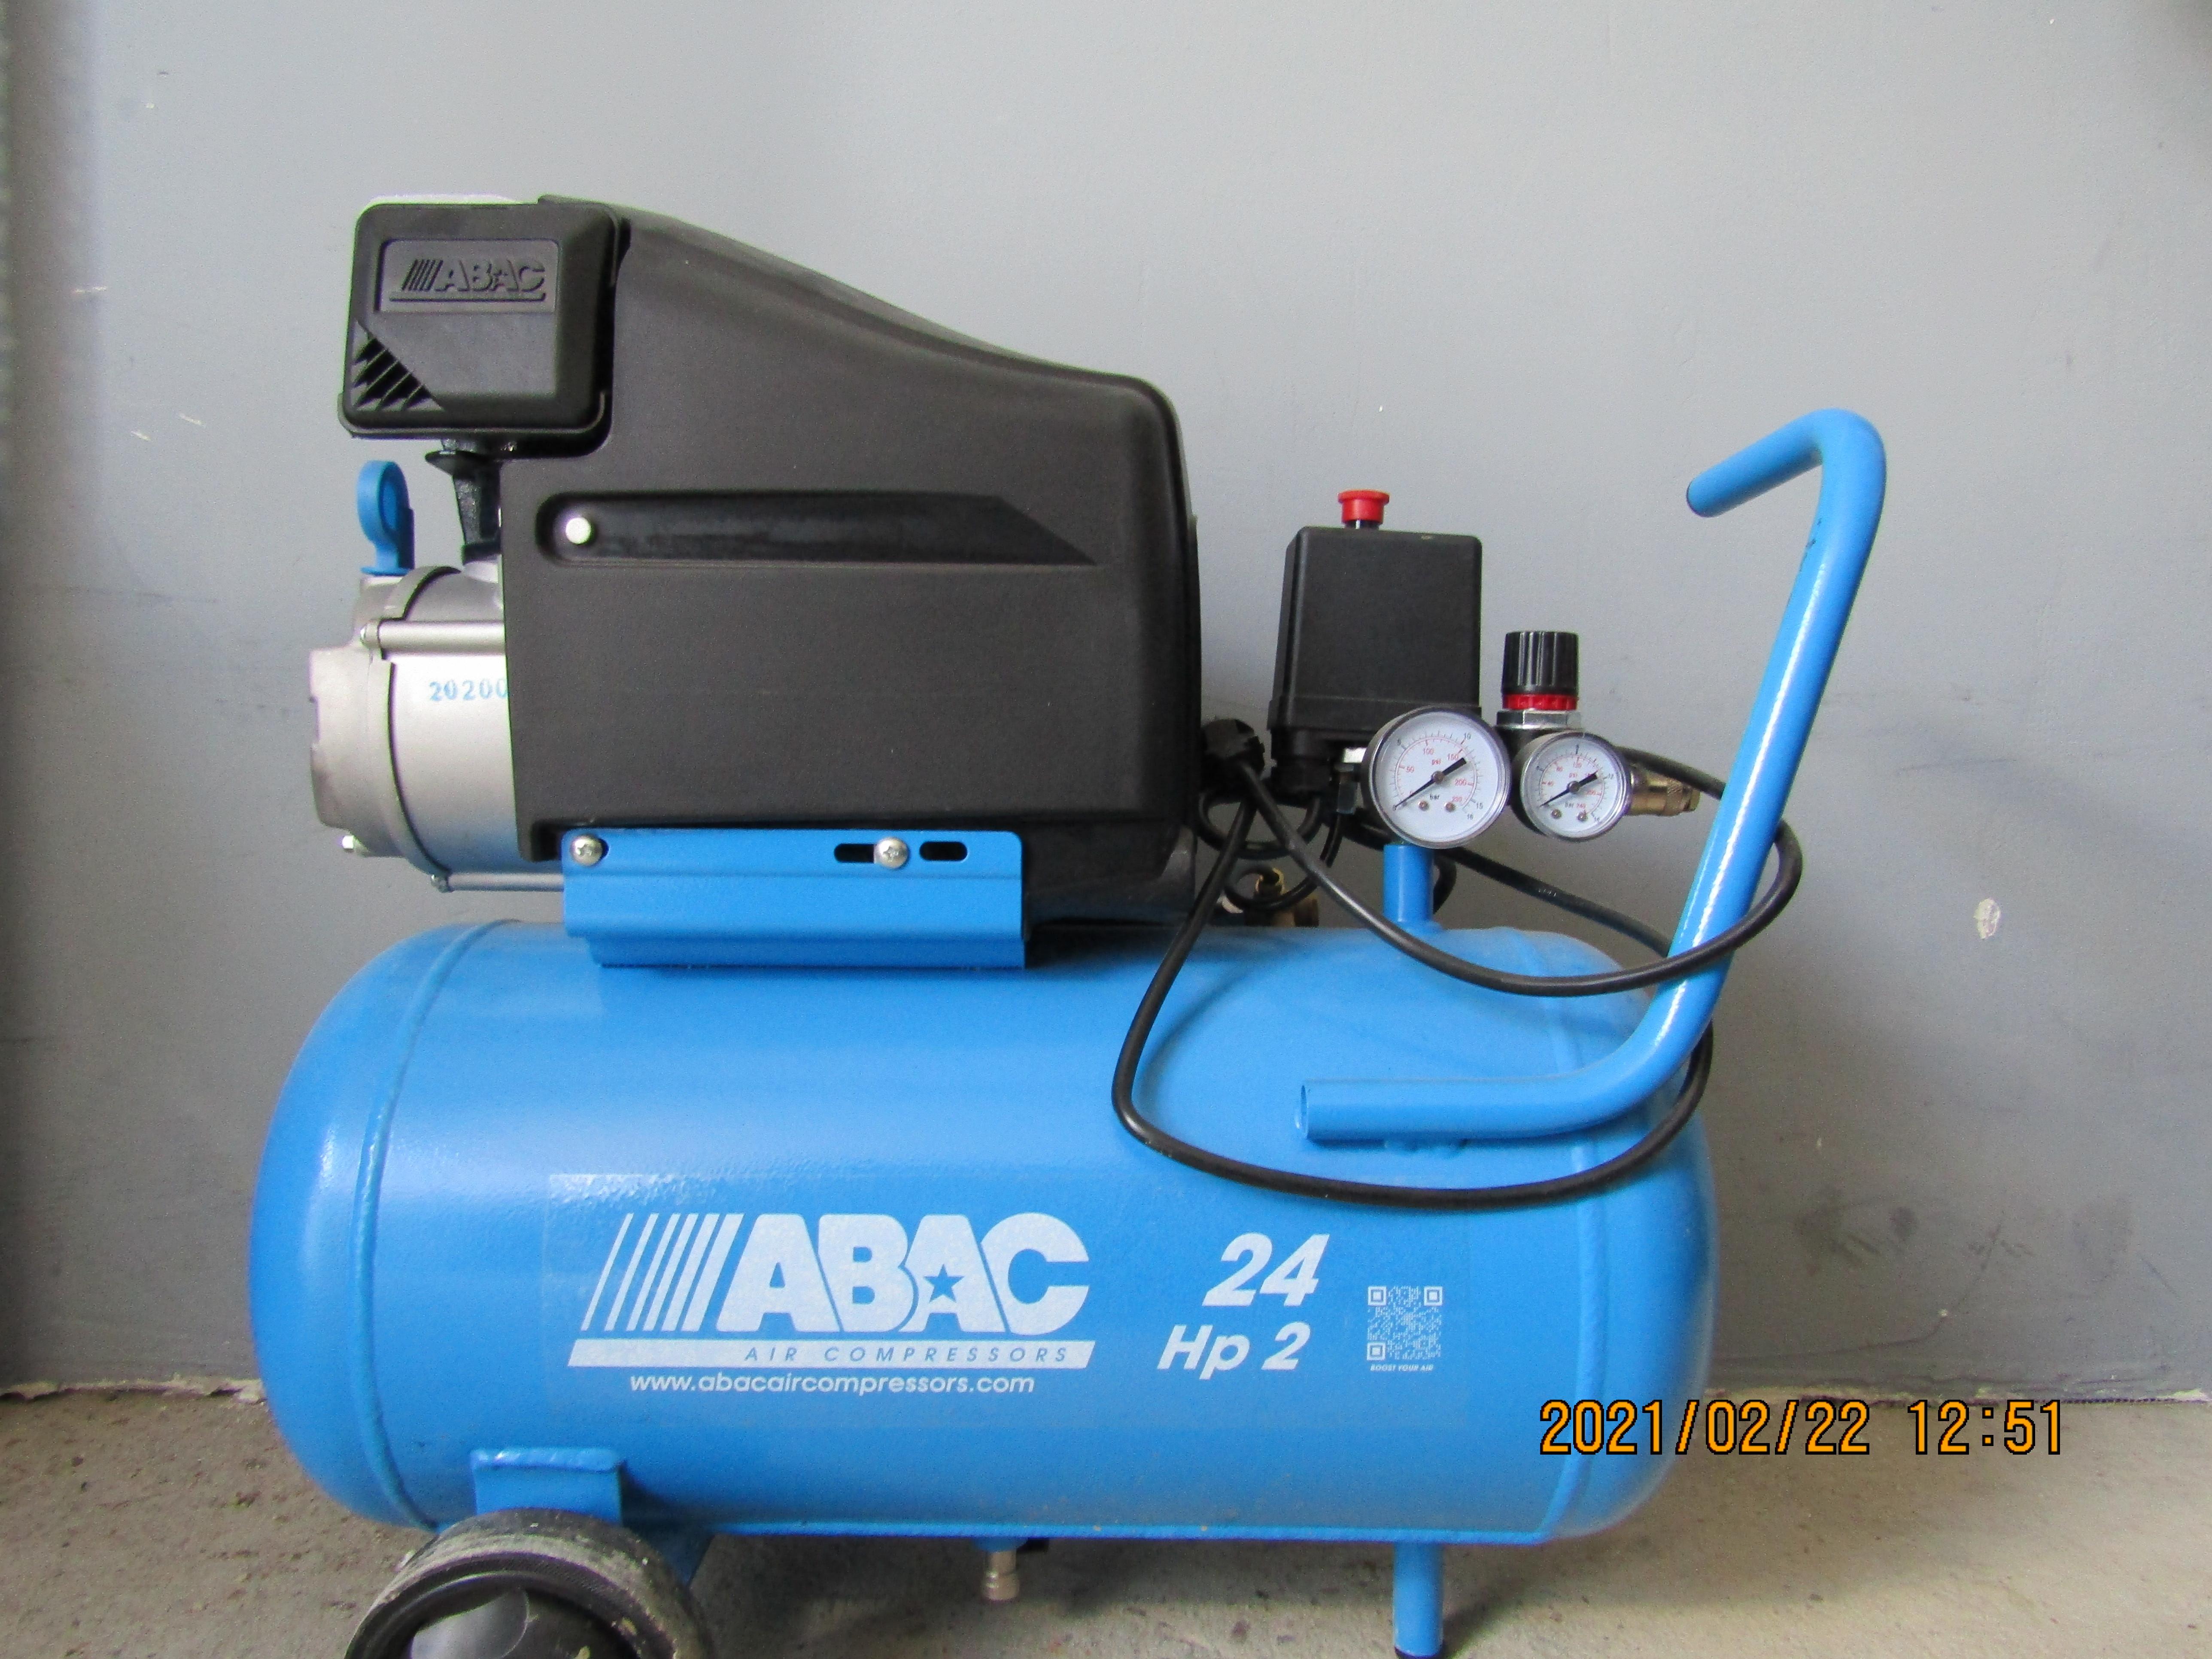 ABAC 24 HP2 kompresszor